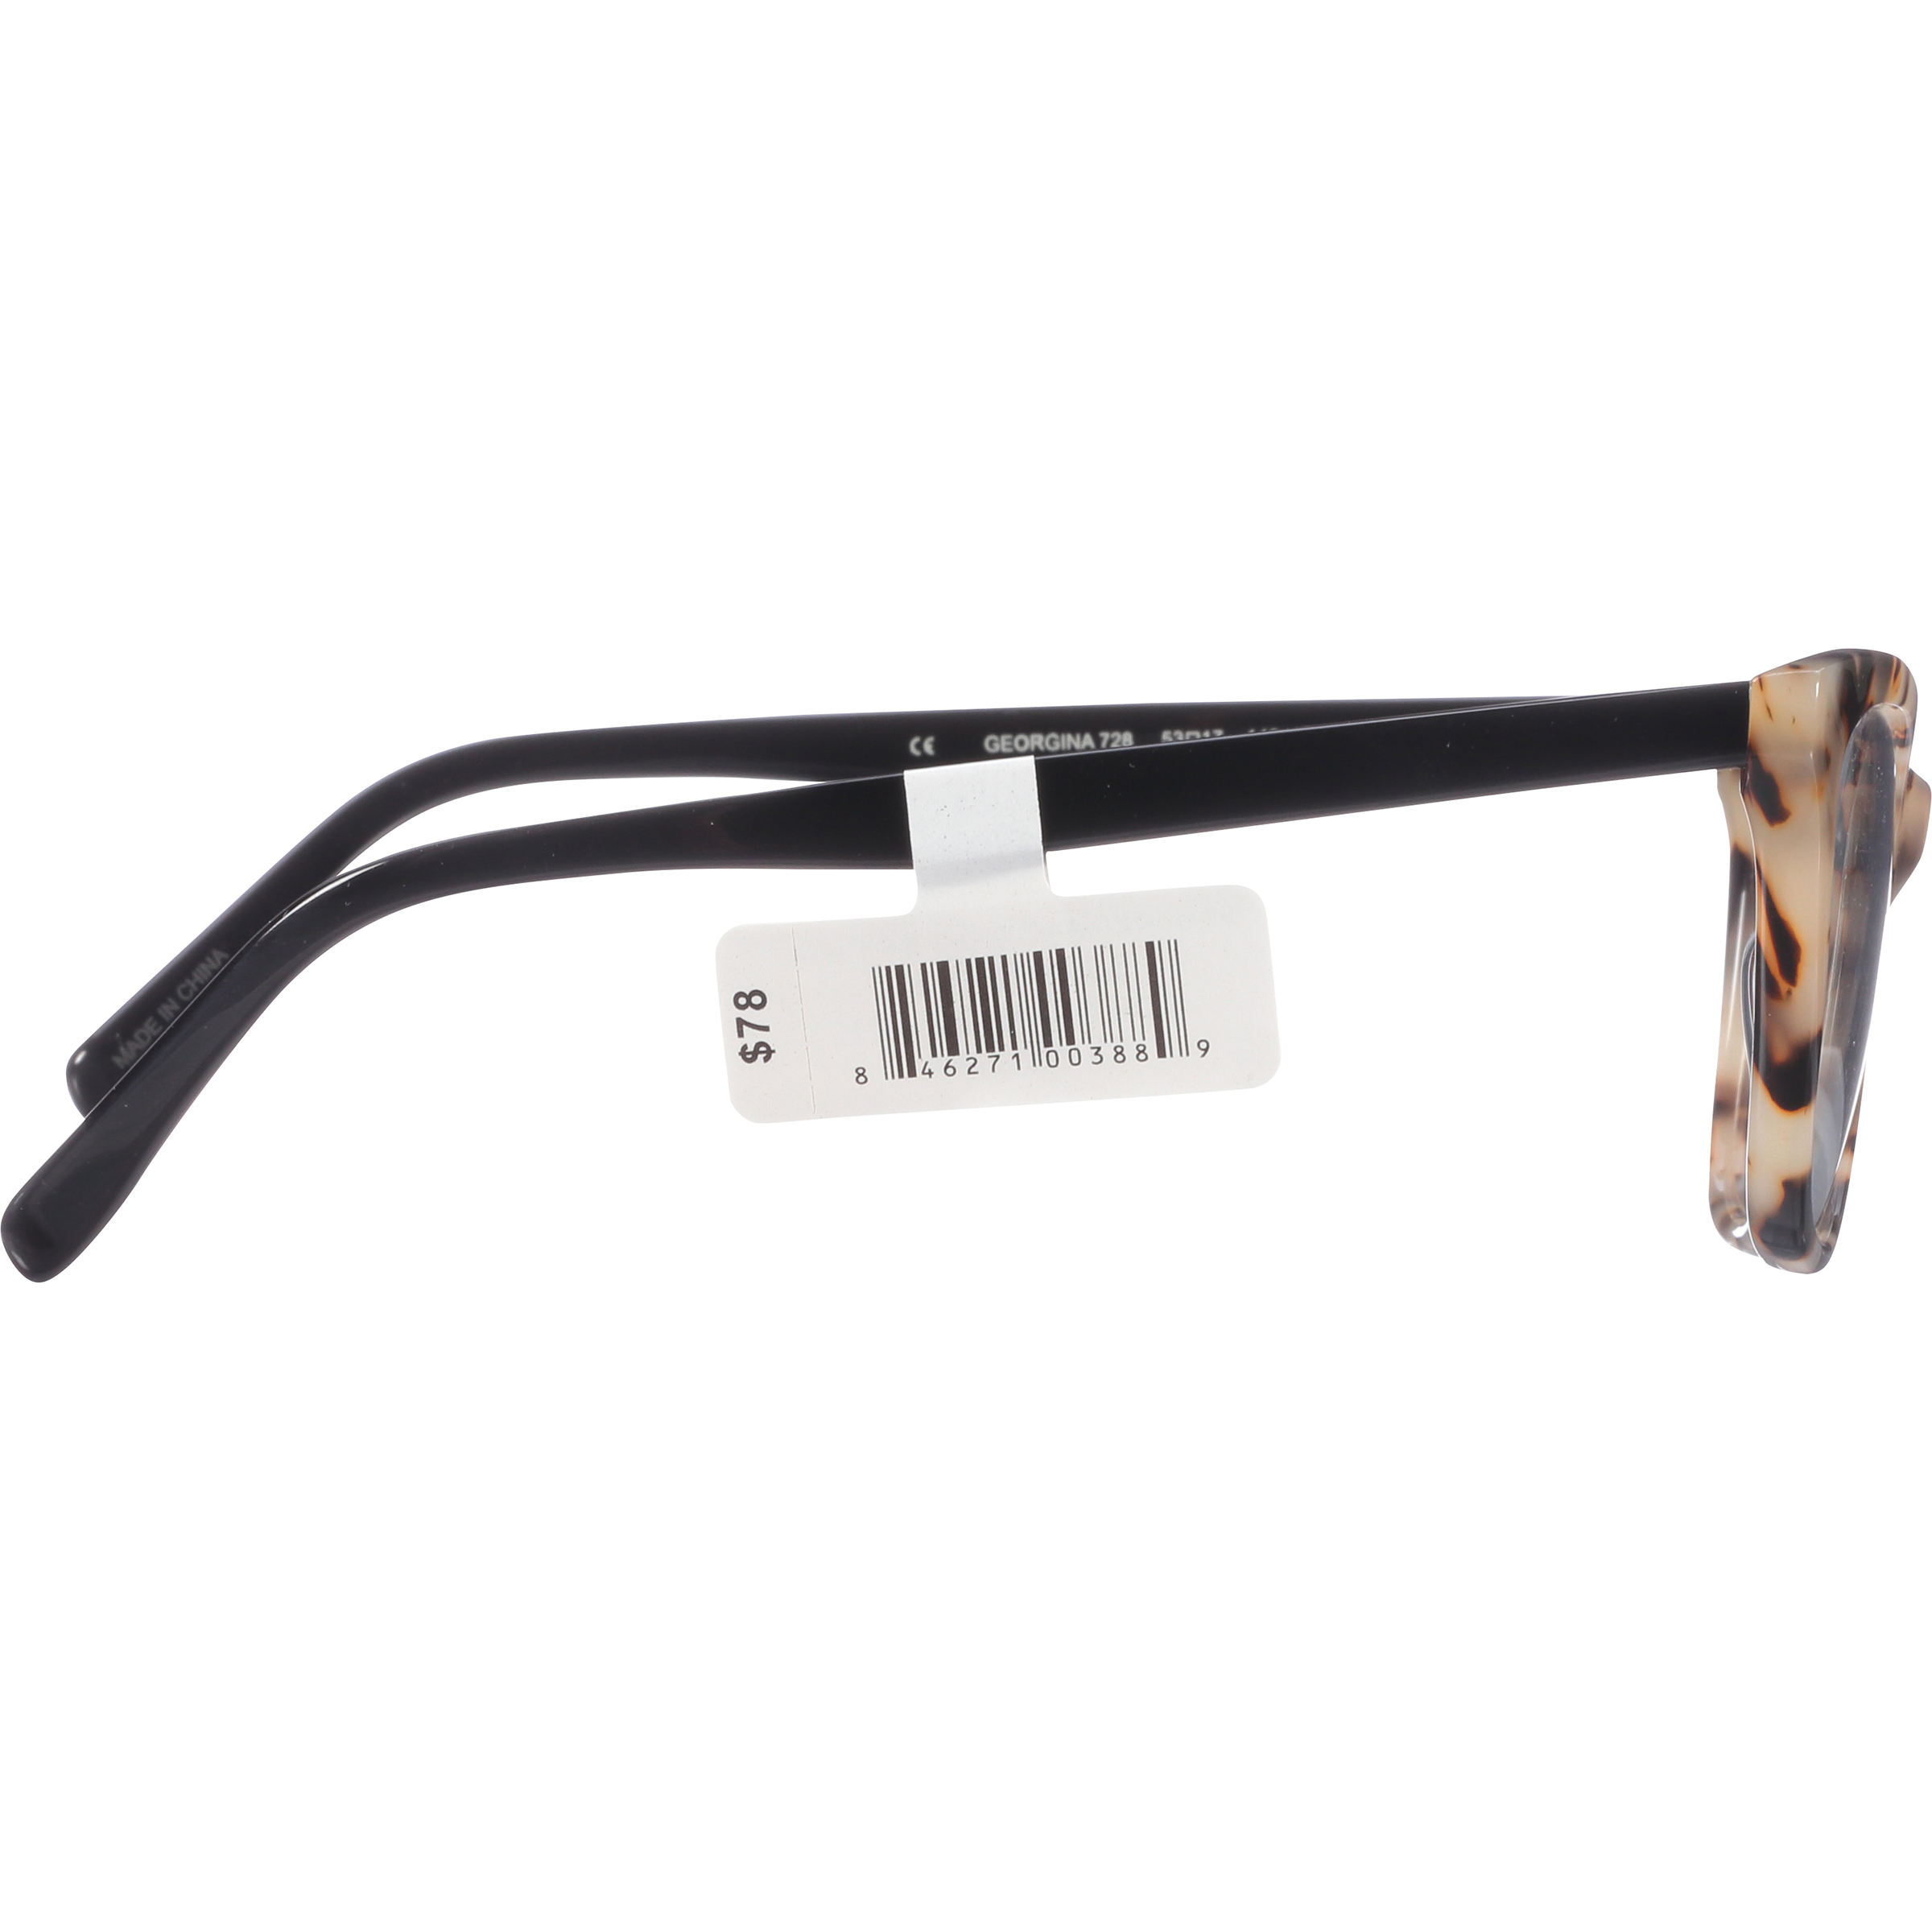 3bbbb003e1f6 Georgina Eyewear Rx-able Eyeglass Frames 728 Black Tortoise - Walmart.com